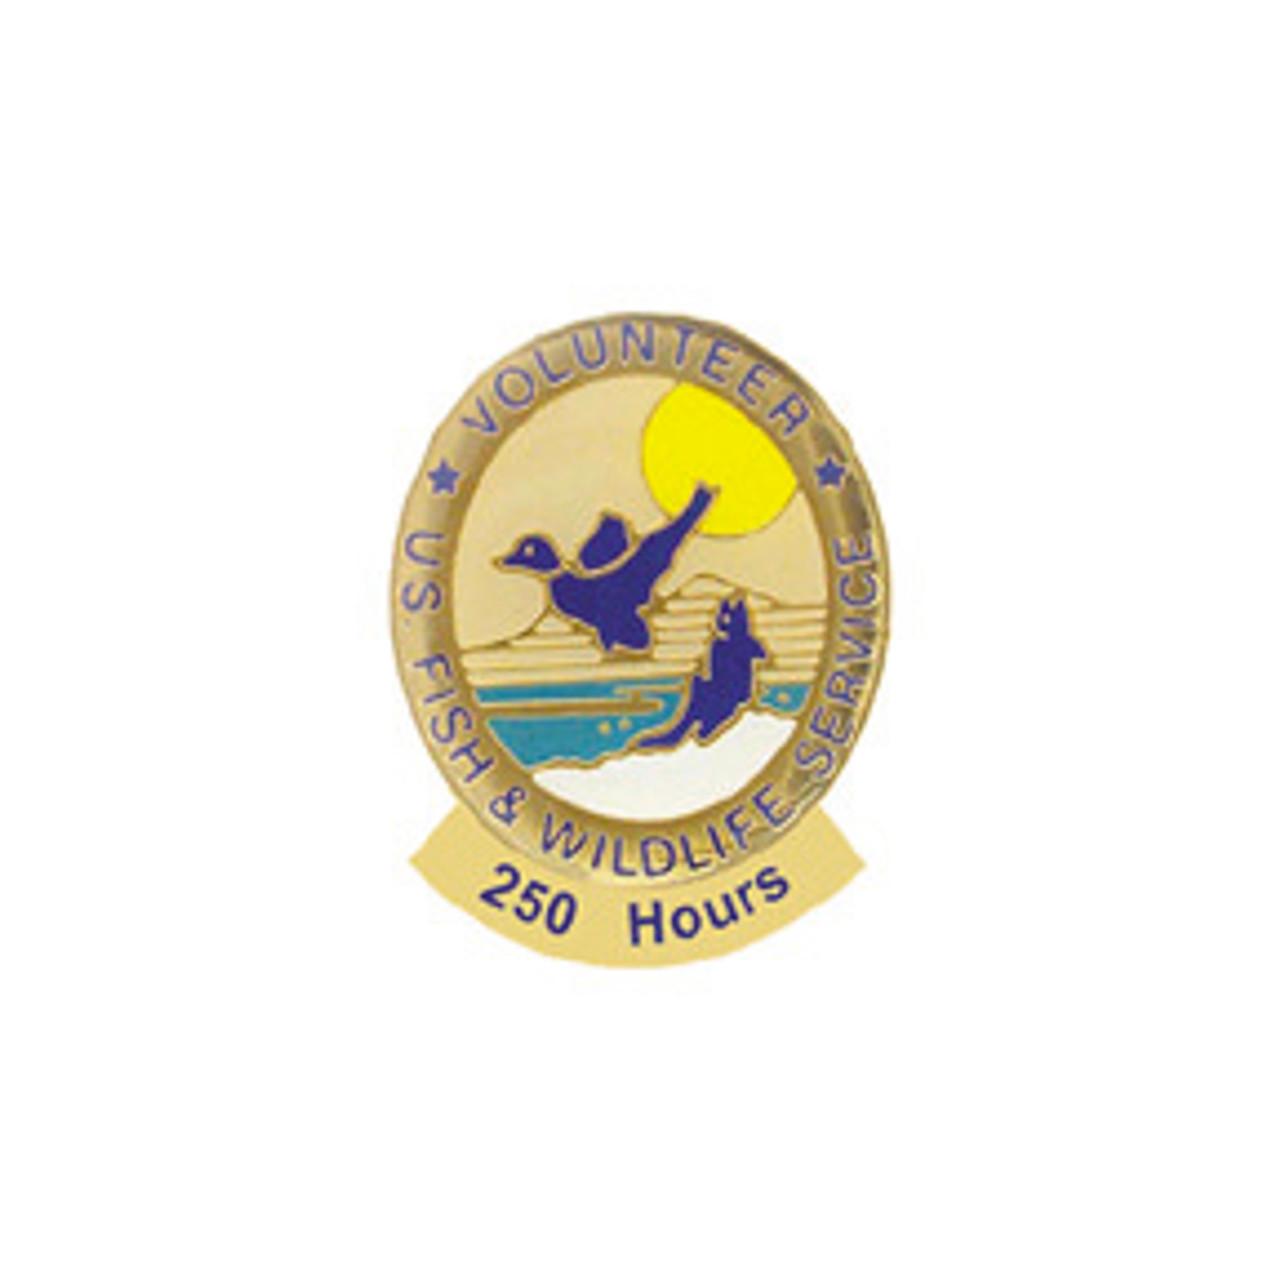 Fish & Wildlife Volunteer Hours Pin (500 hours)